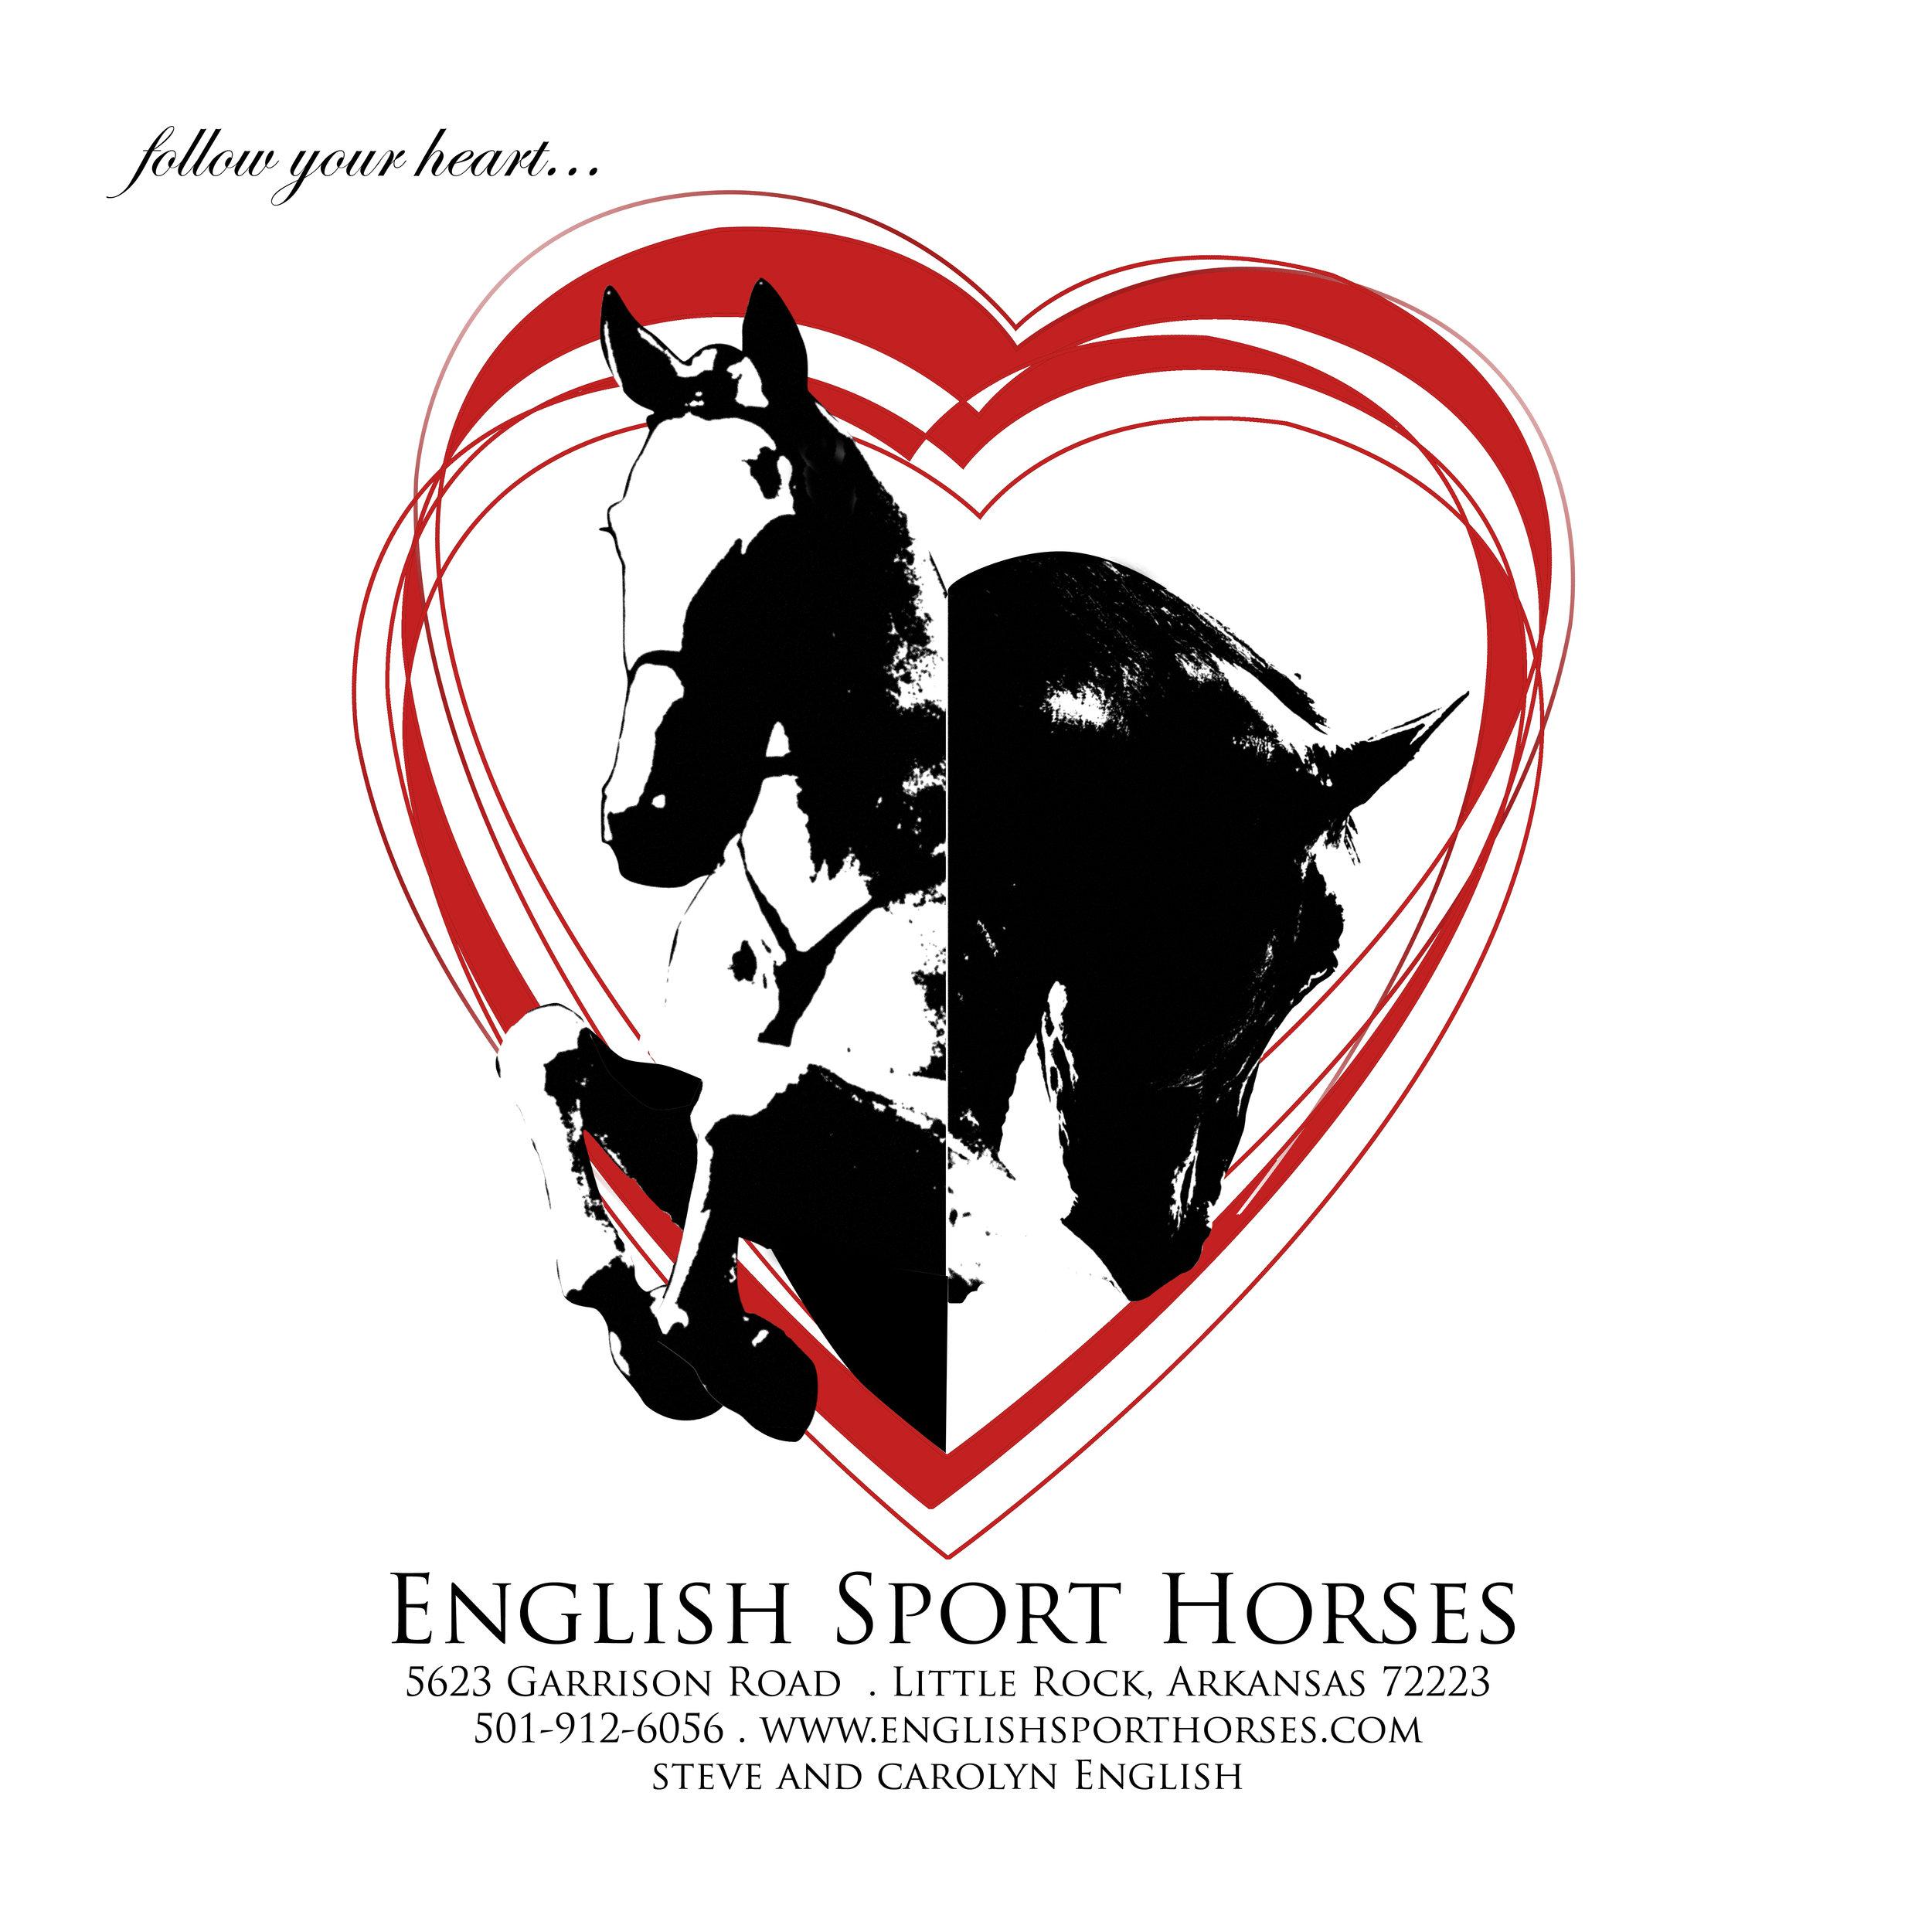 English Sport Horses_7 copy.jpg